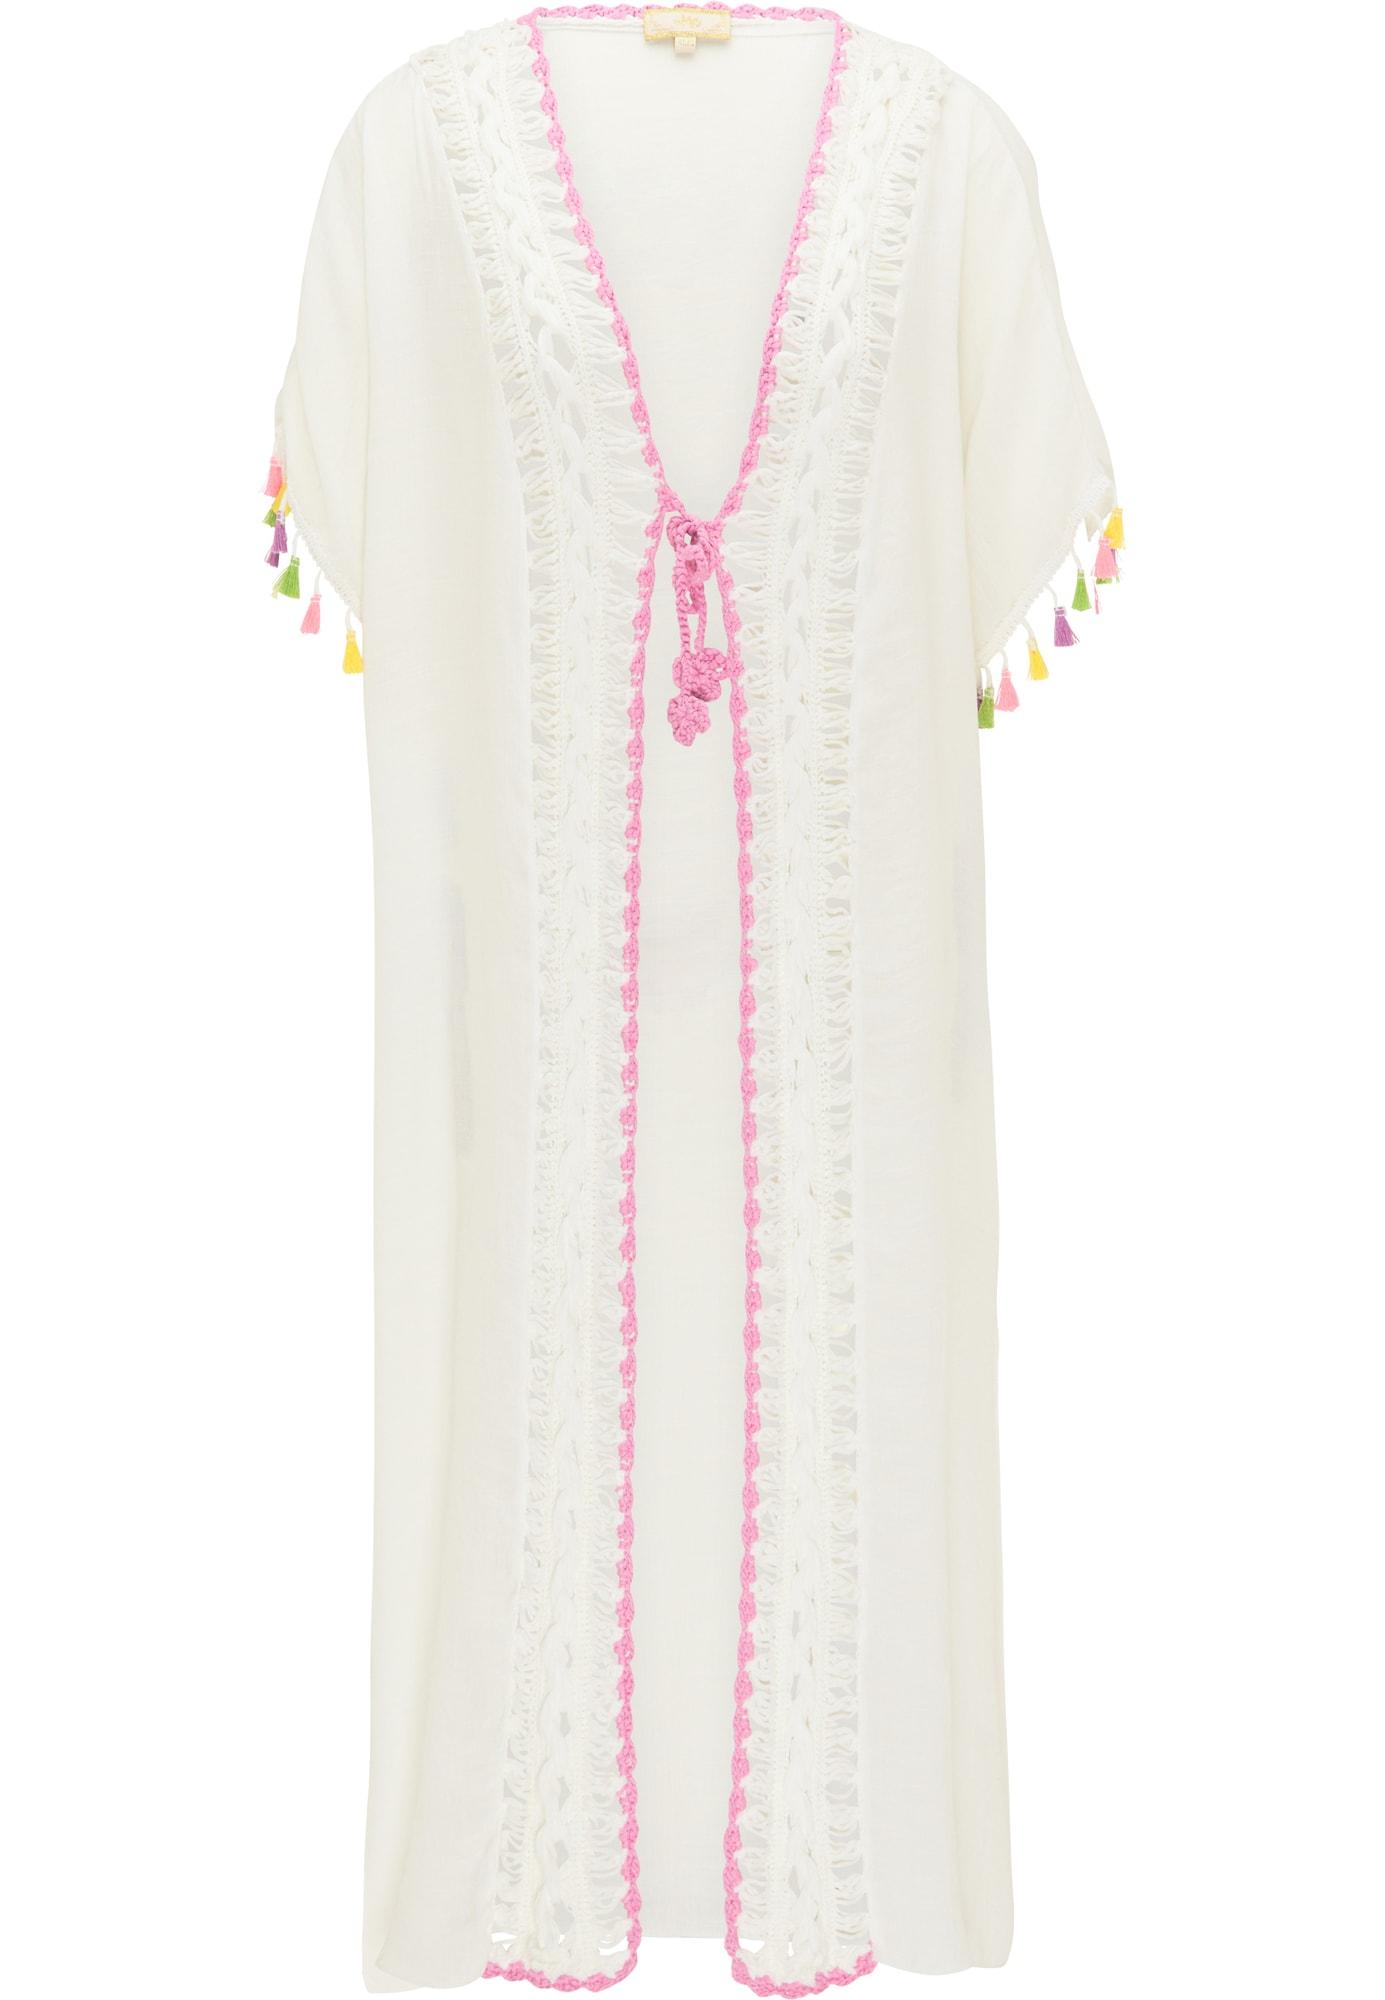 MYMO Kimono balta / mišrios spalvos